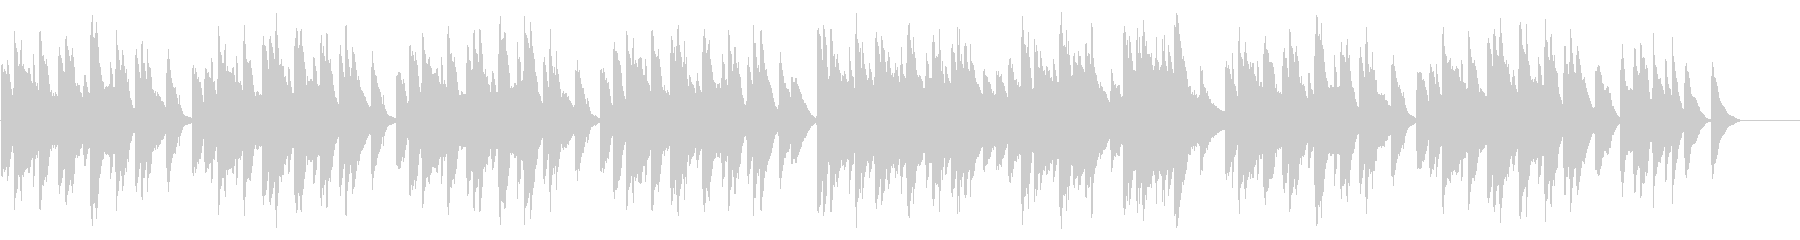 SNS広告 ピアノメイン かわいいの未再生の波形